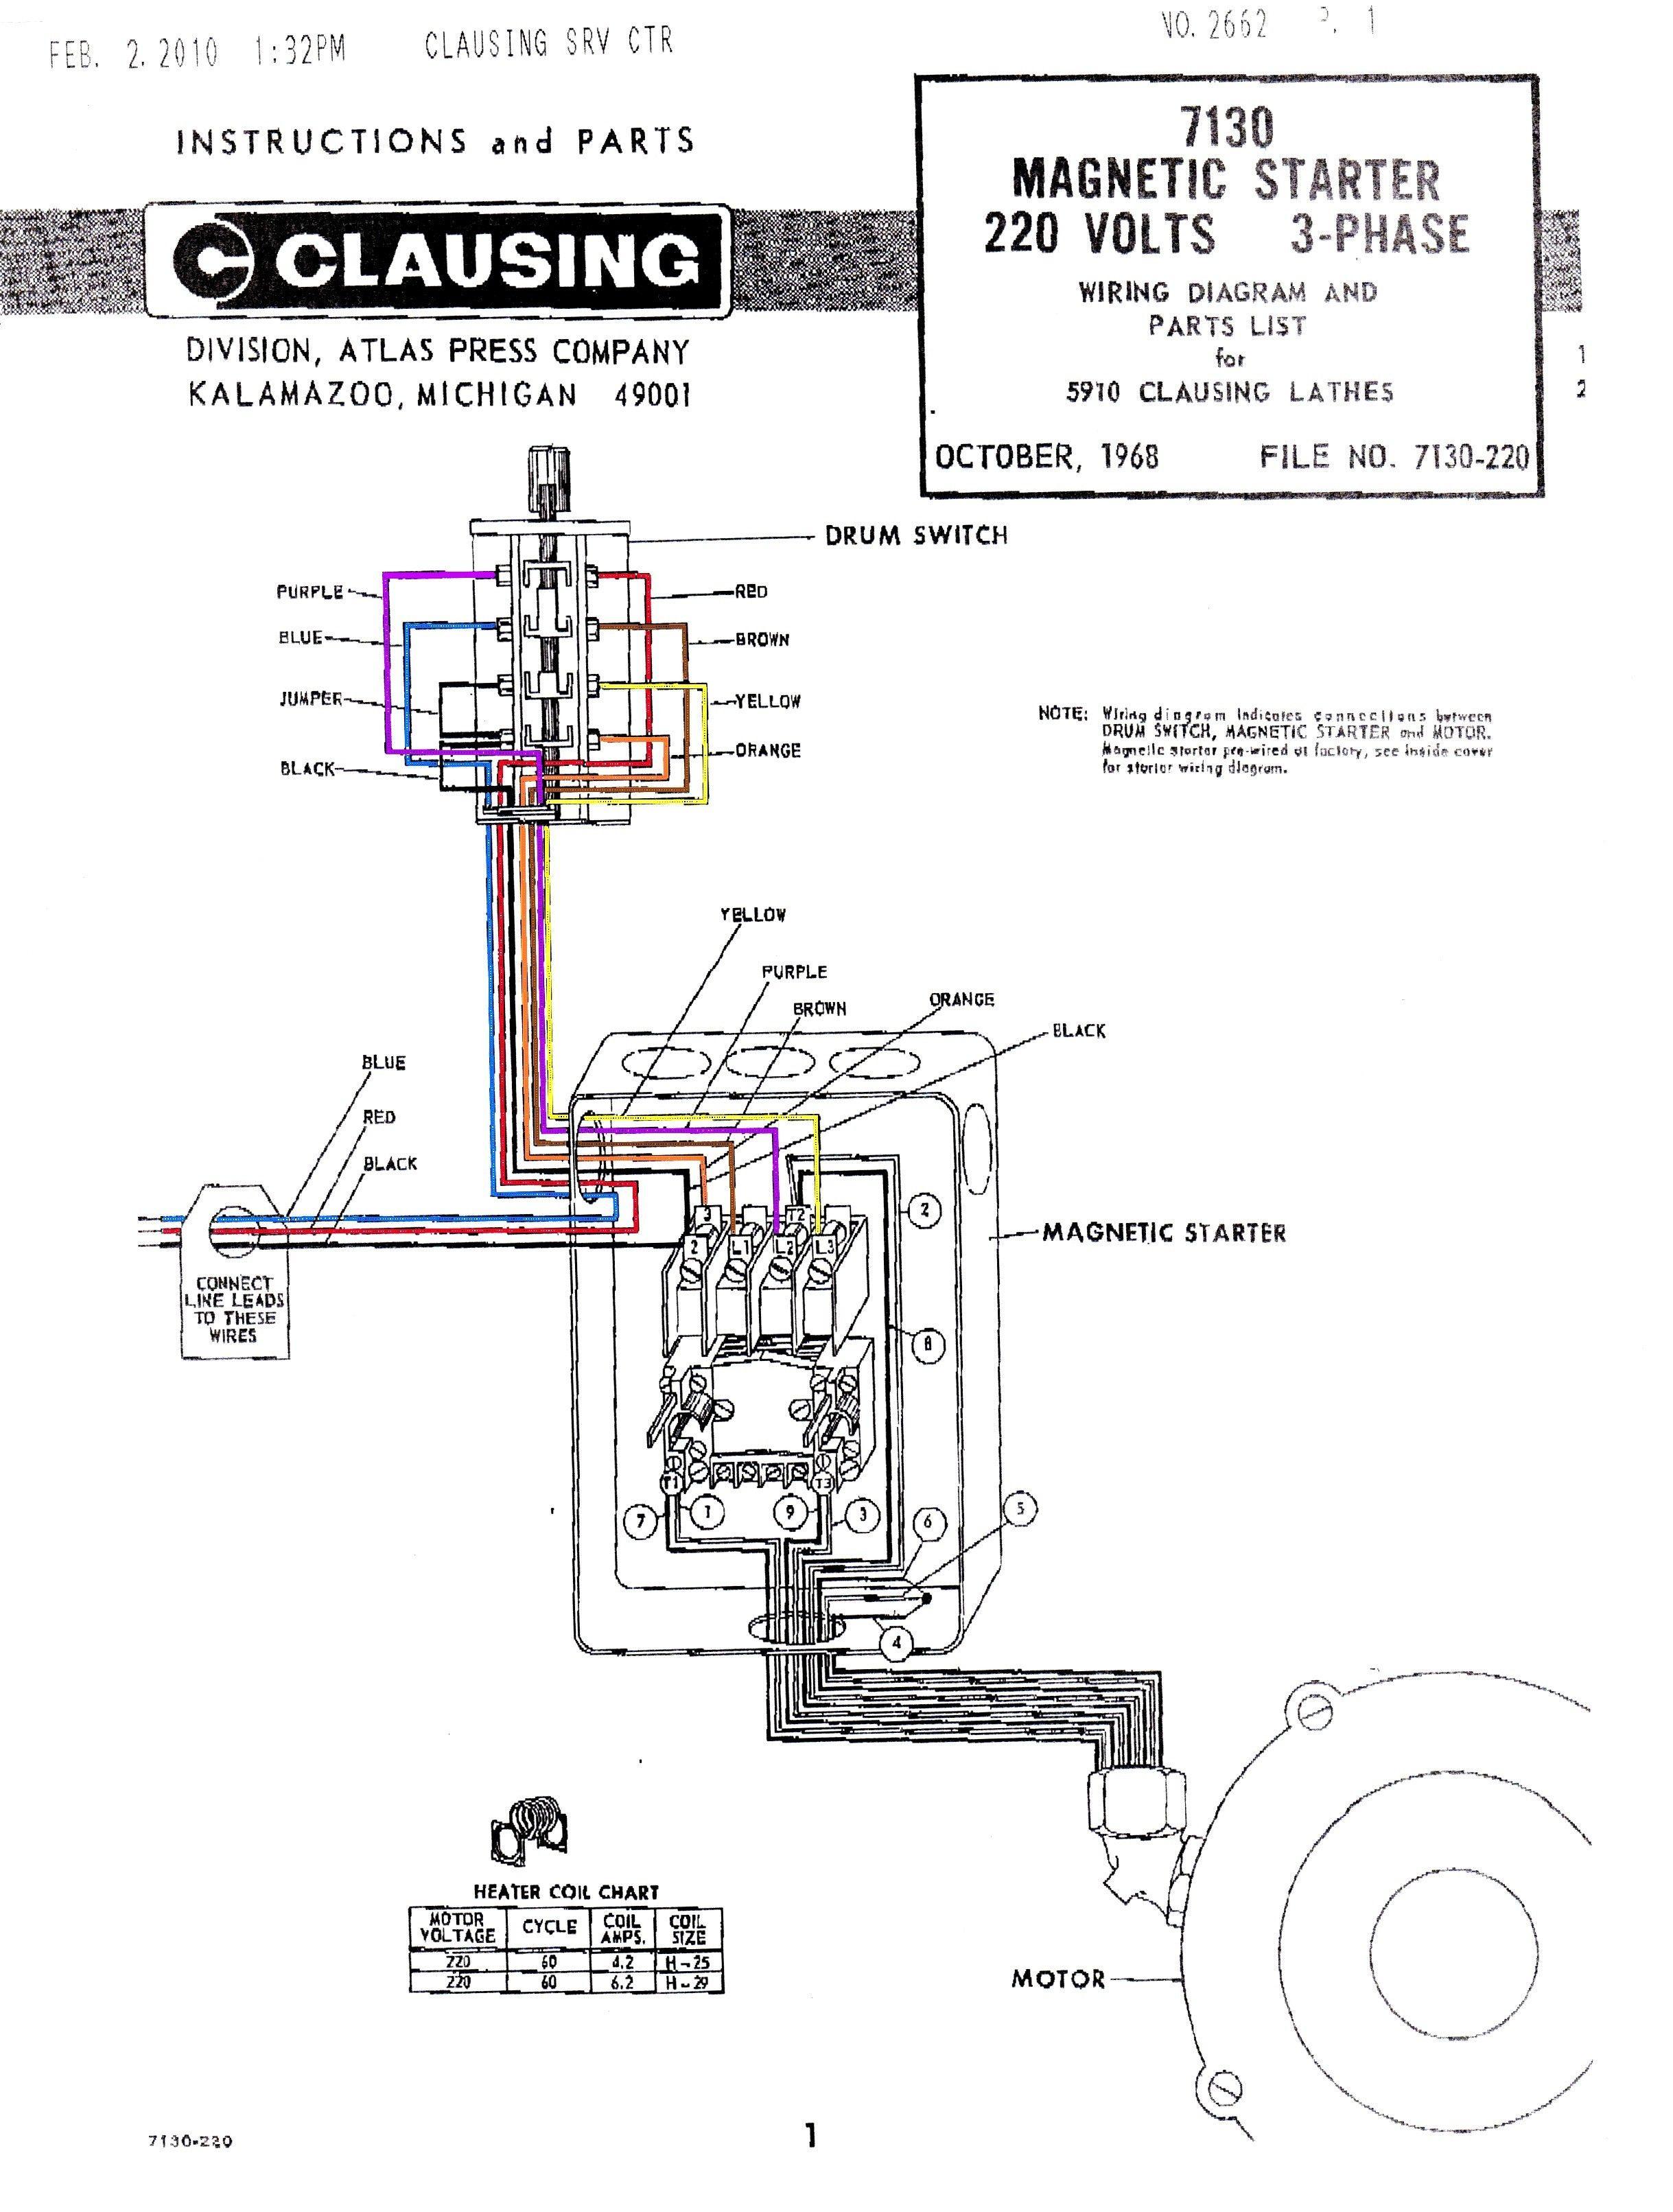 General Electric Motor Starter Diagram   Diagram, Circuit diagram, Wire   Ge Motor Starter Wiring Diagrams      Pinterest